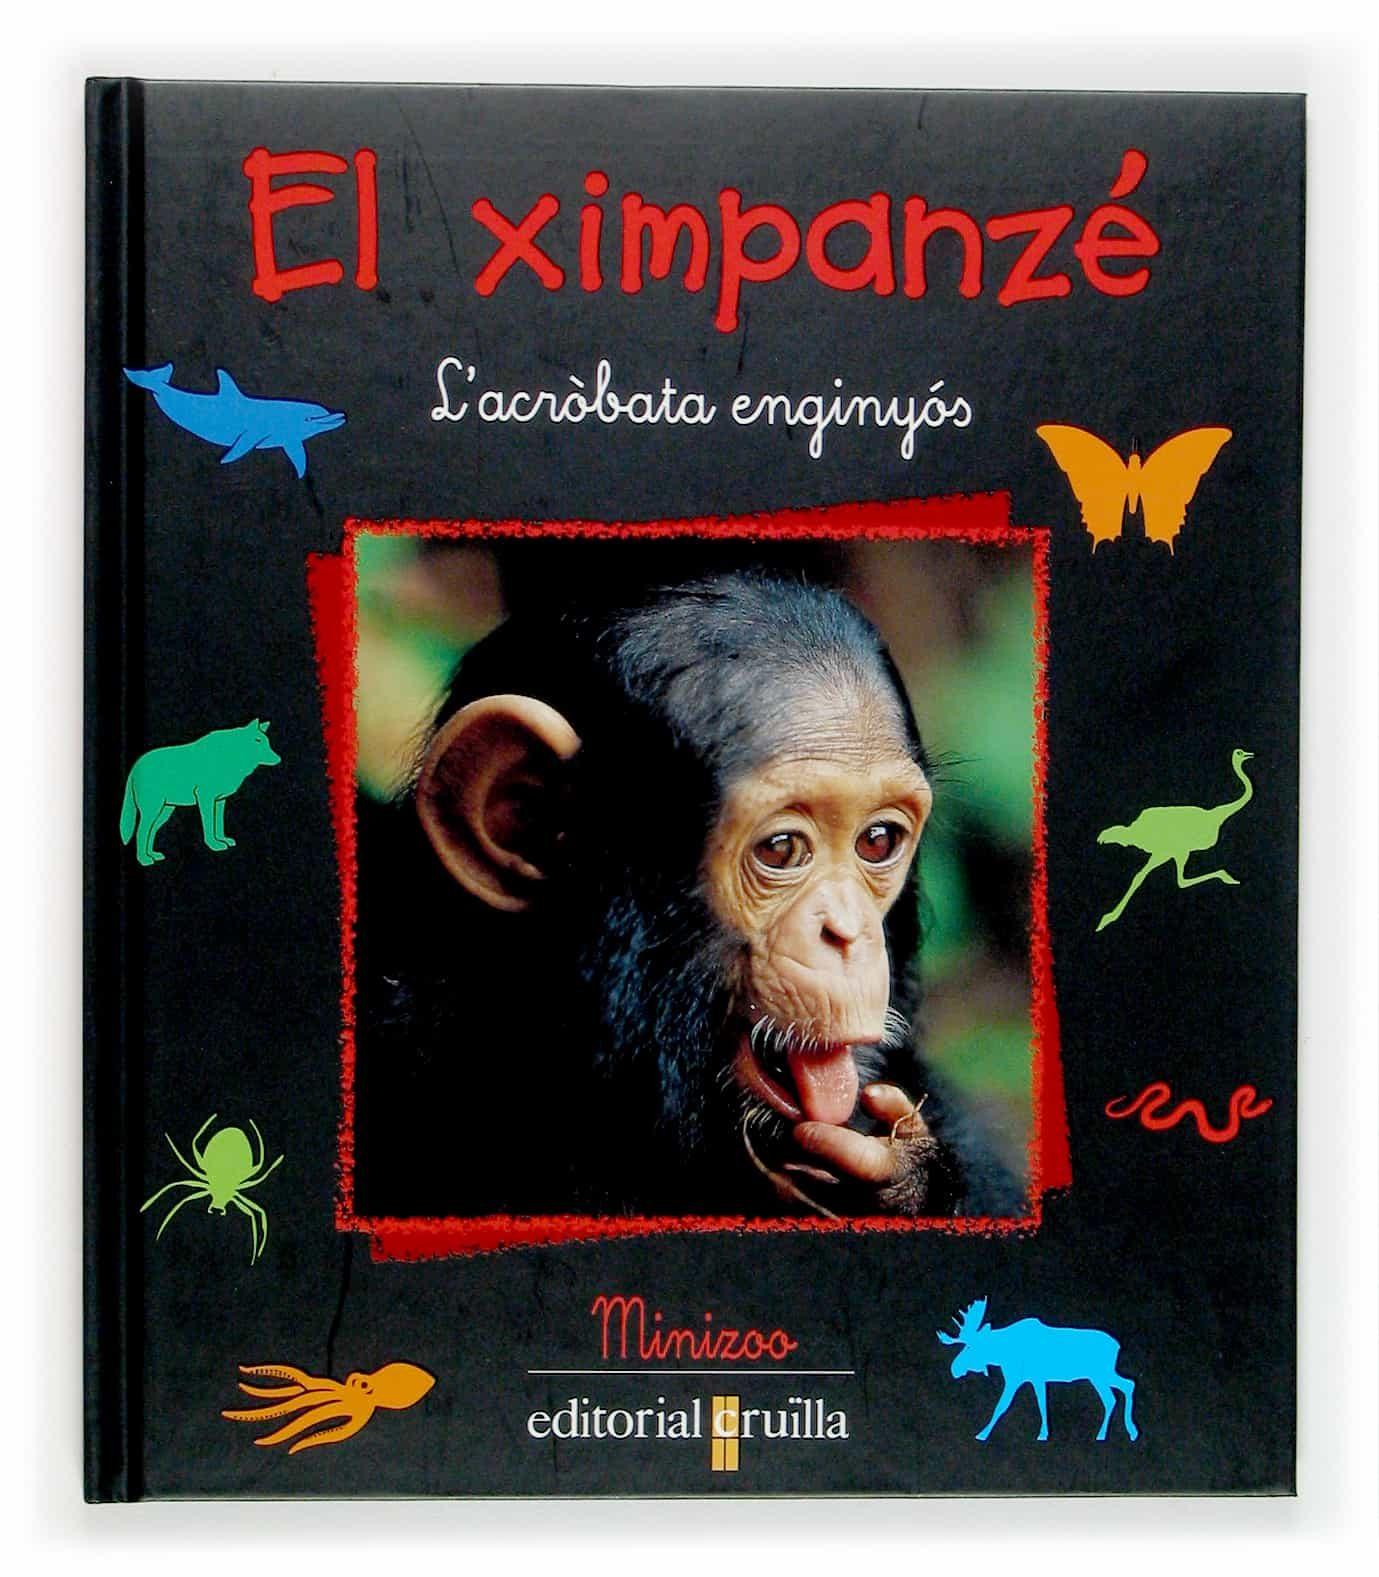 El Ximpanze por Vv.aa. epub